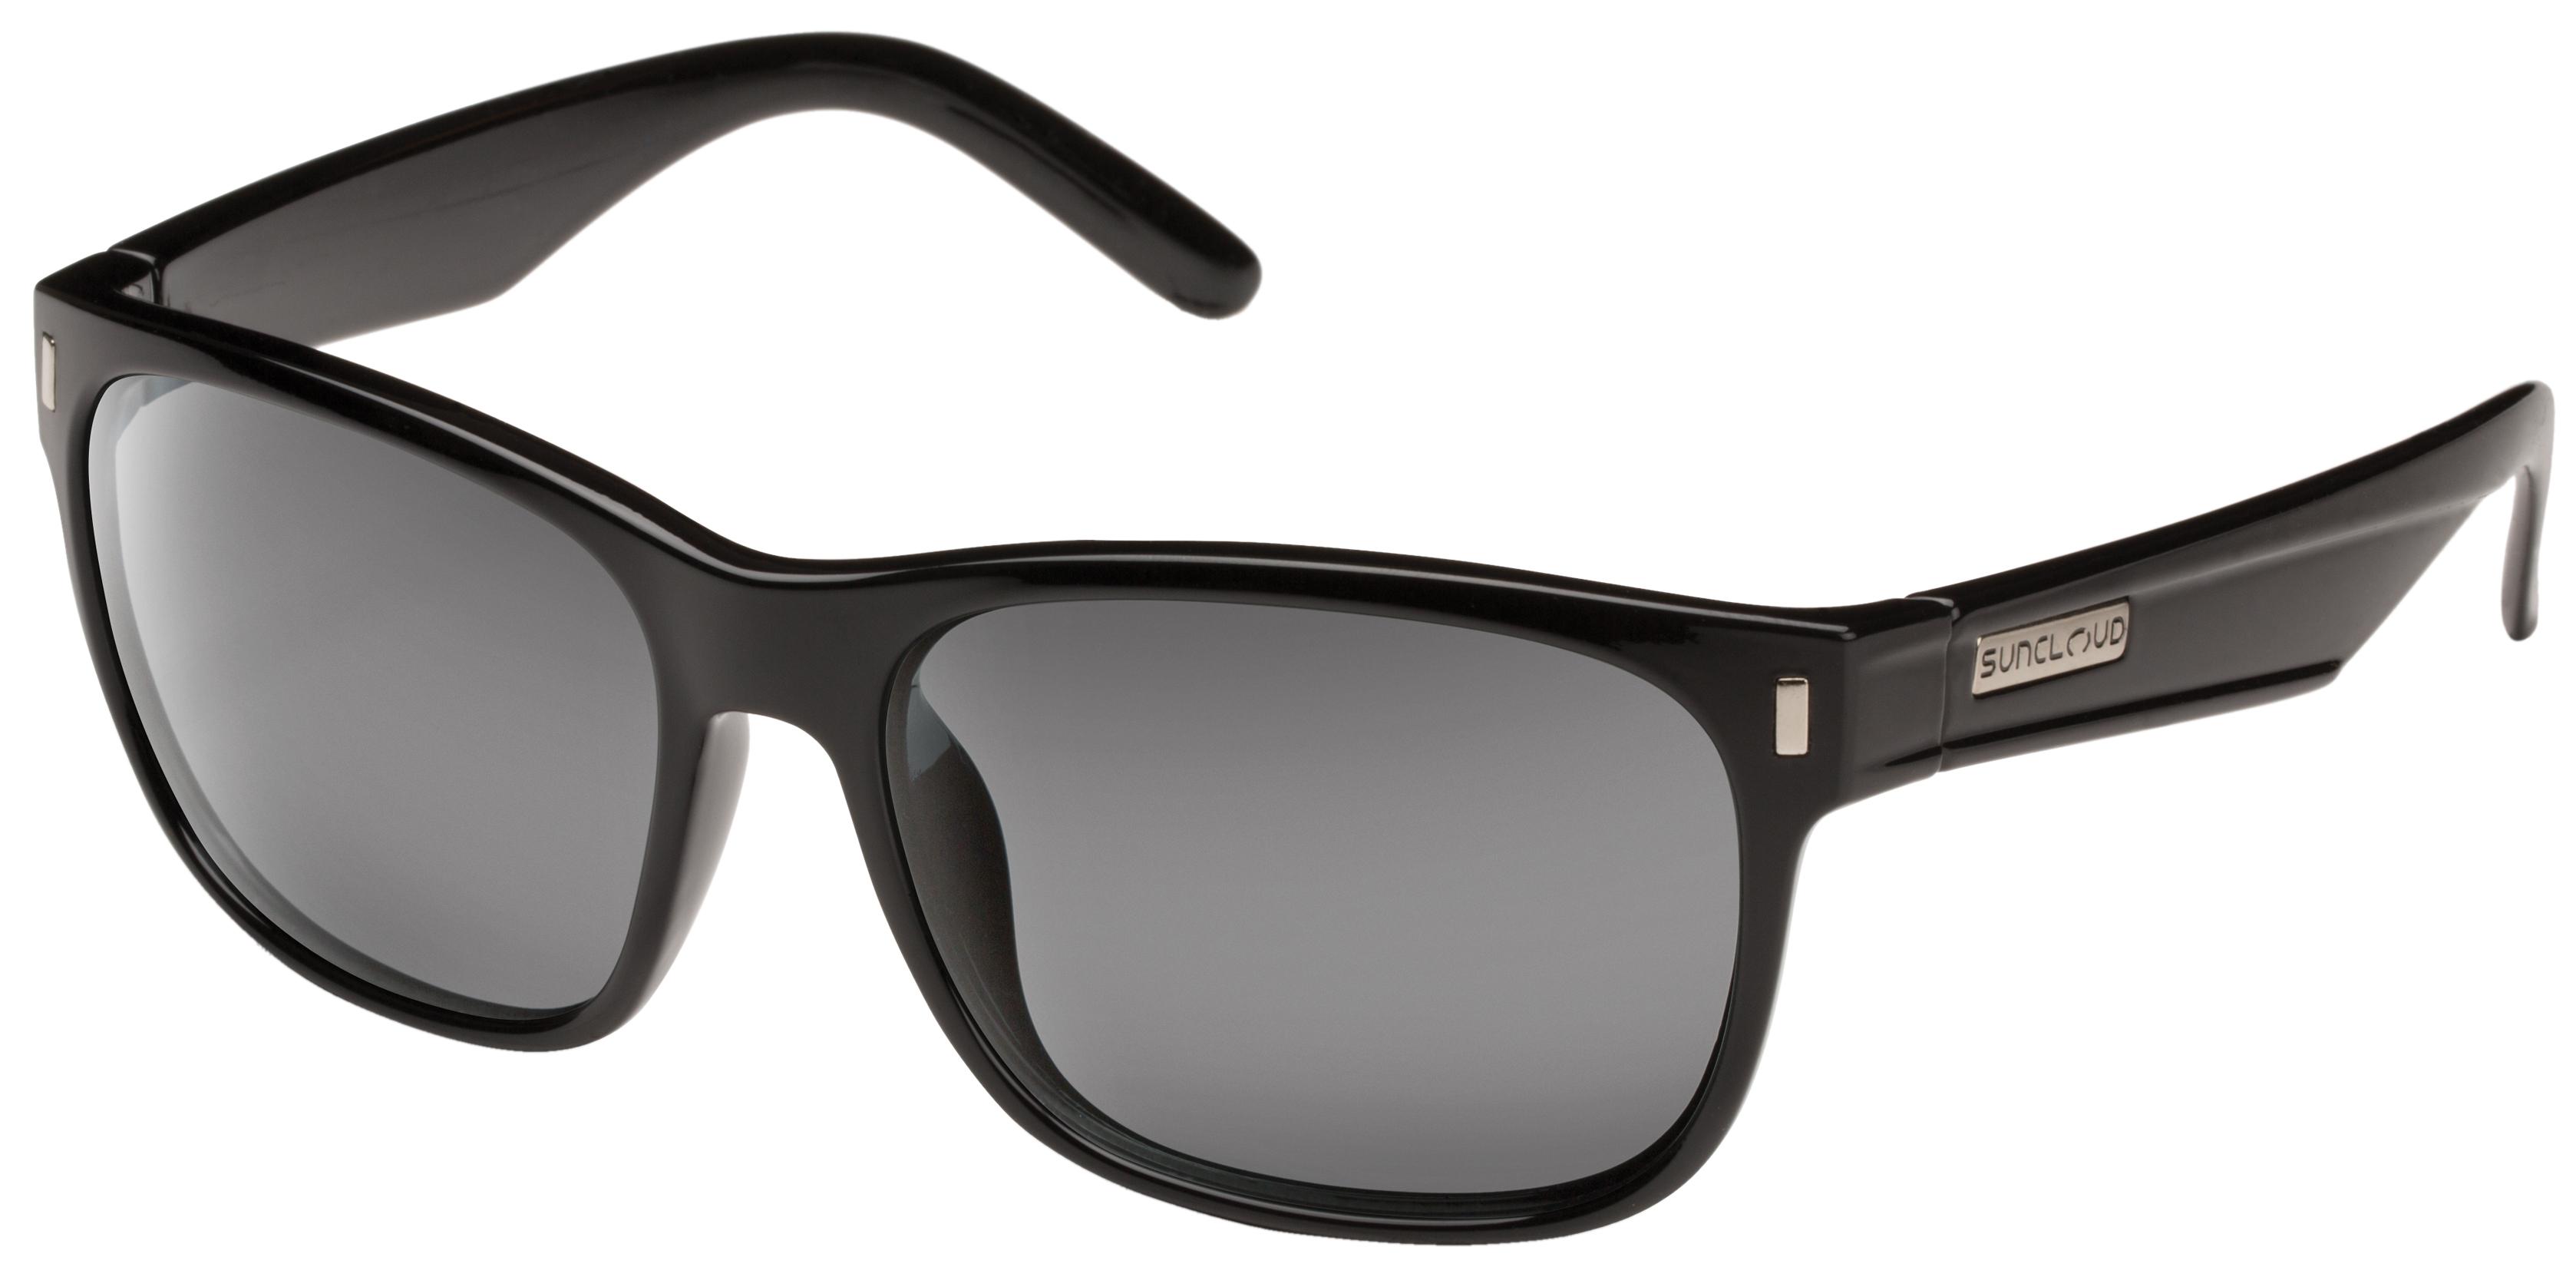 7dbe7854c4e Suncloud Dashboard Polarized Sunglasses - Unisex